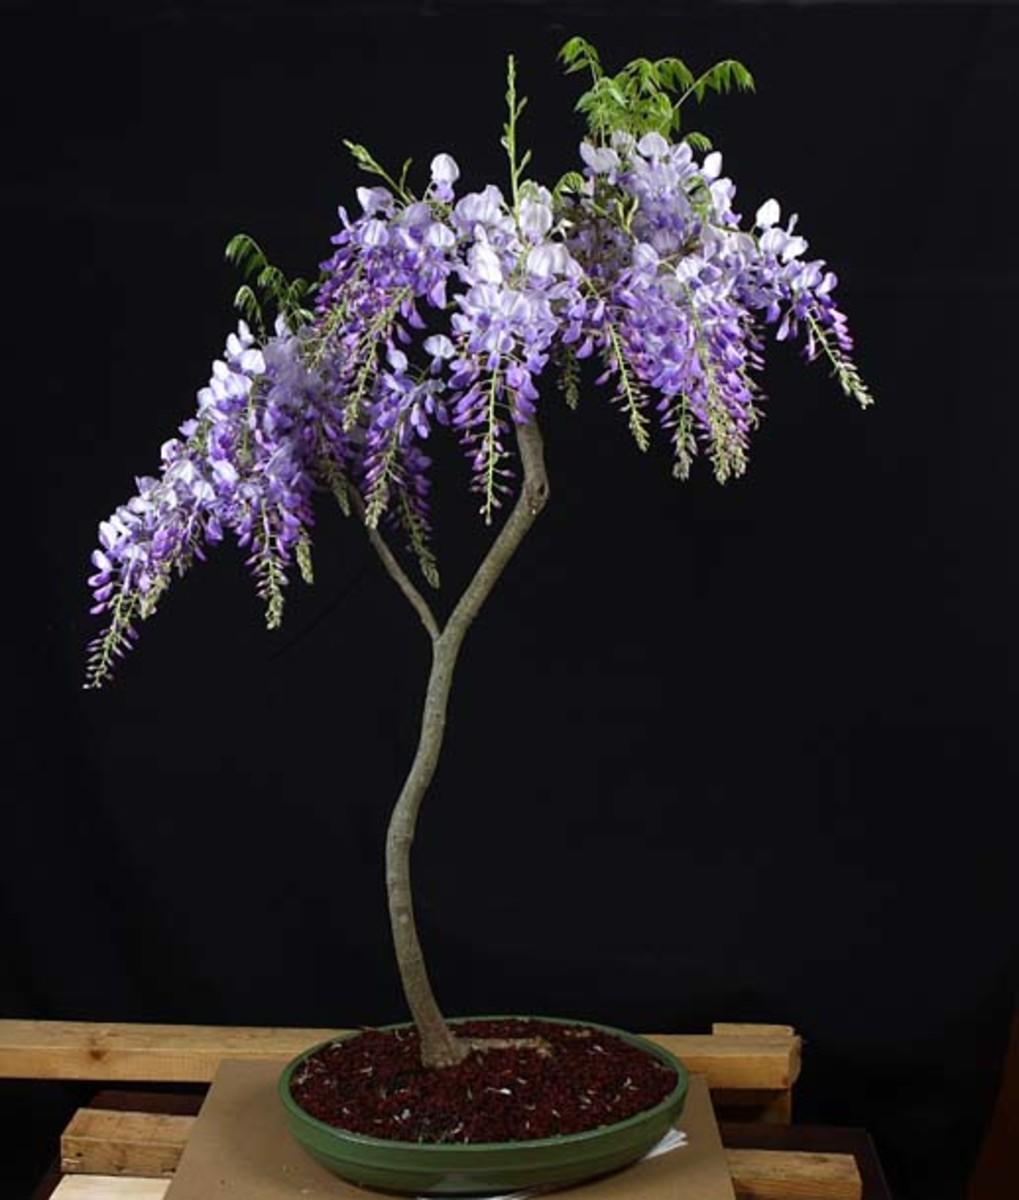 wisteria trained as a bonsai